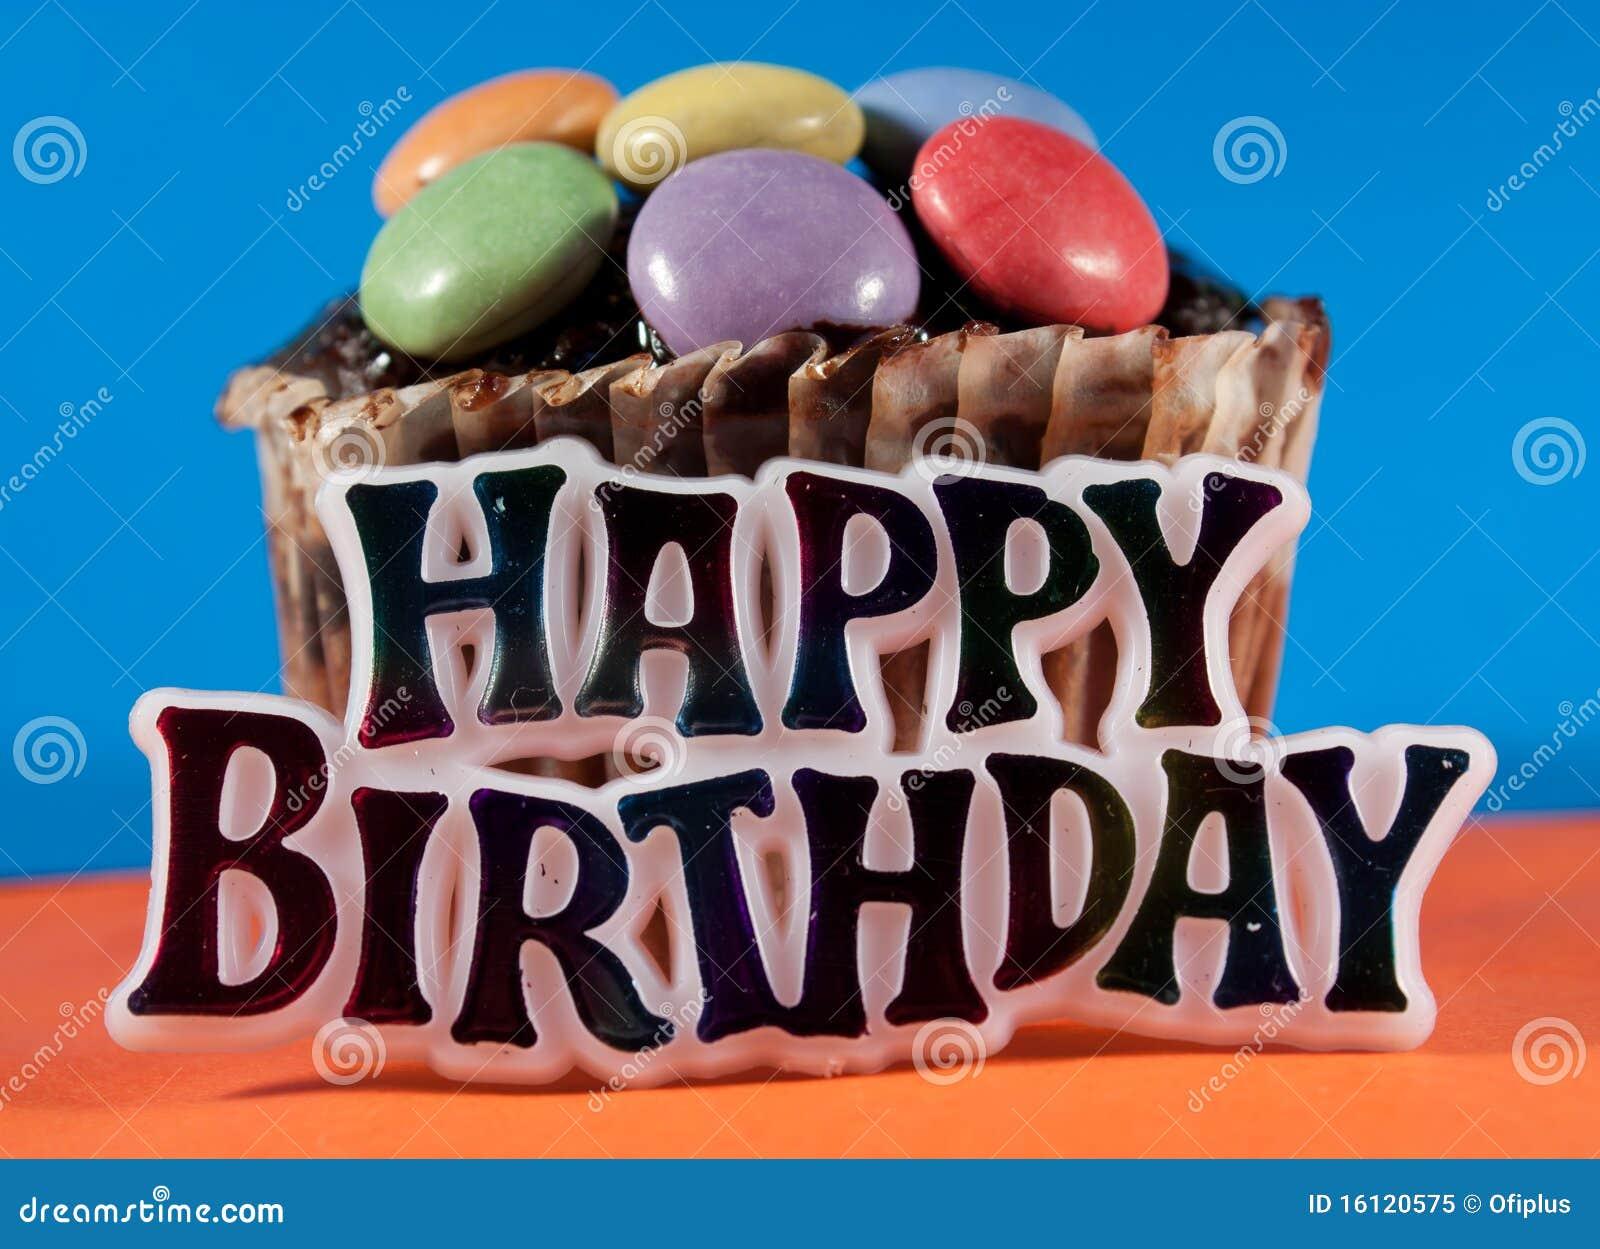 Royalty Free Birthday Images ~ Happy birthday royalty free stock photo image